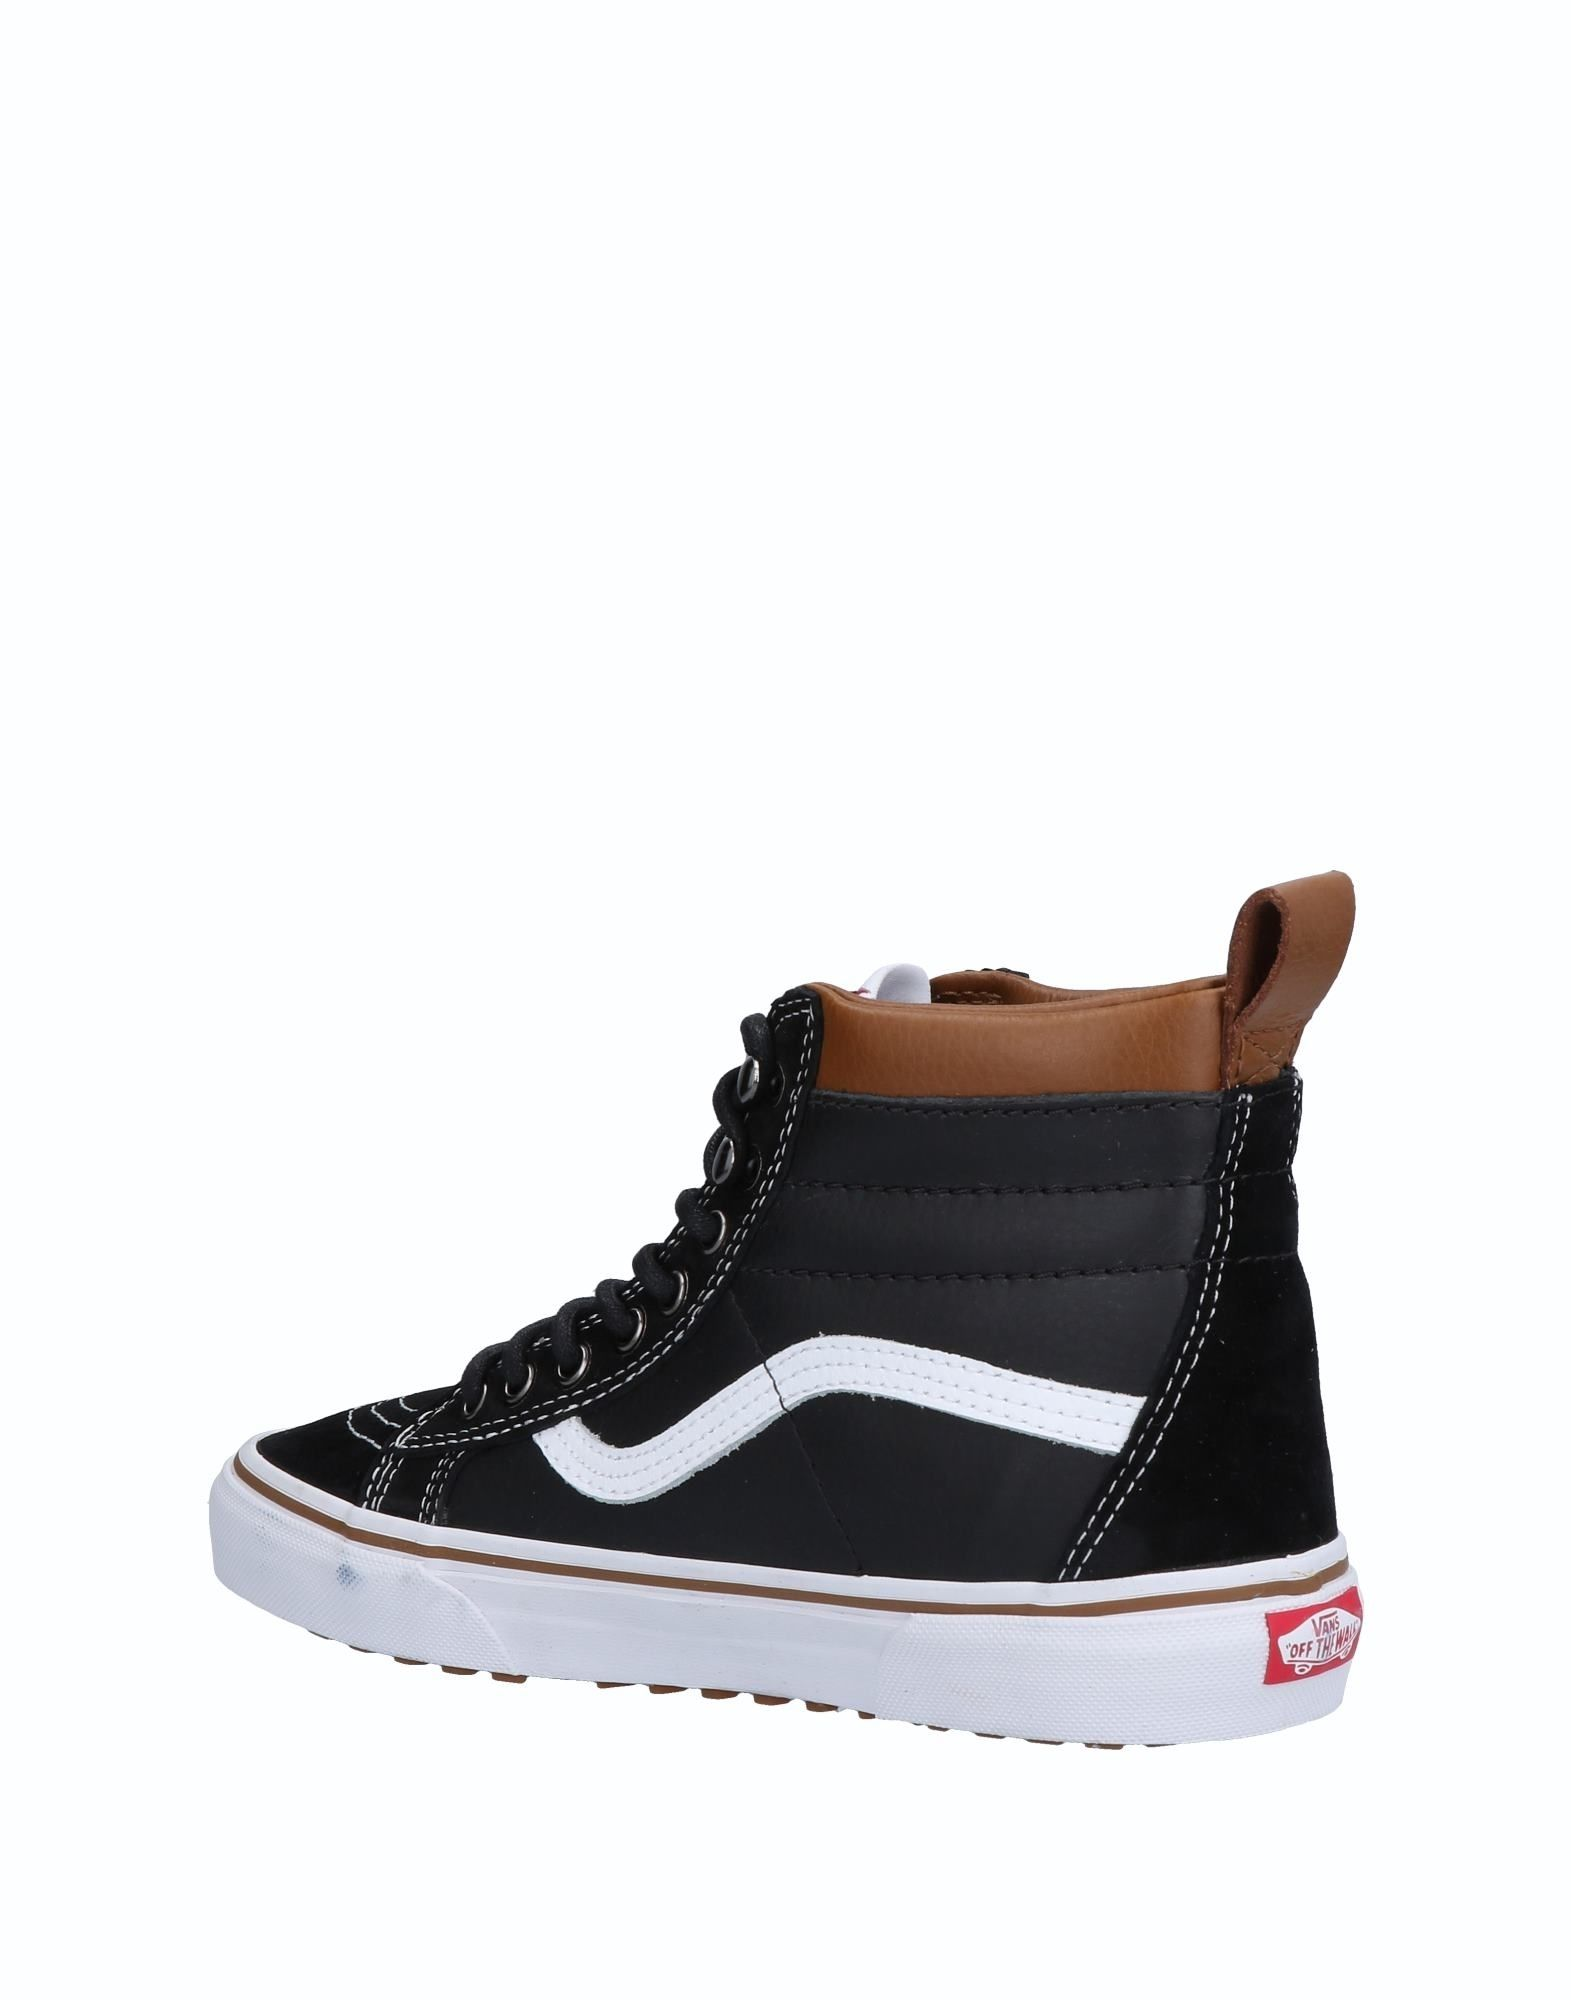 Vans Vans Vans Sneakers - Men Vans Sneakers online on  United Kingdom - 11502649BX 81d29a